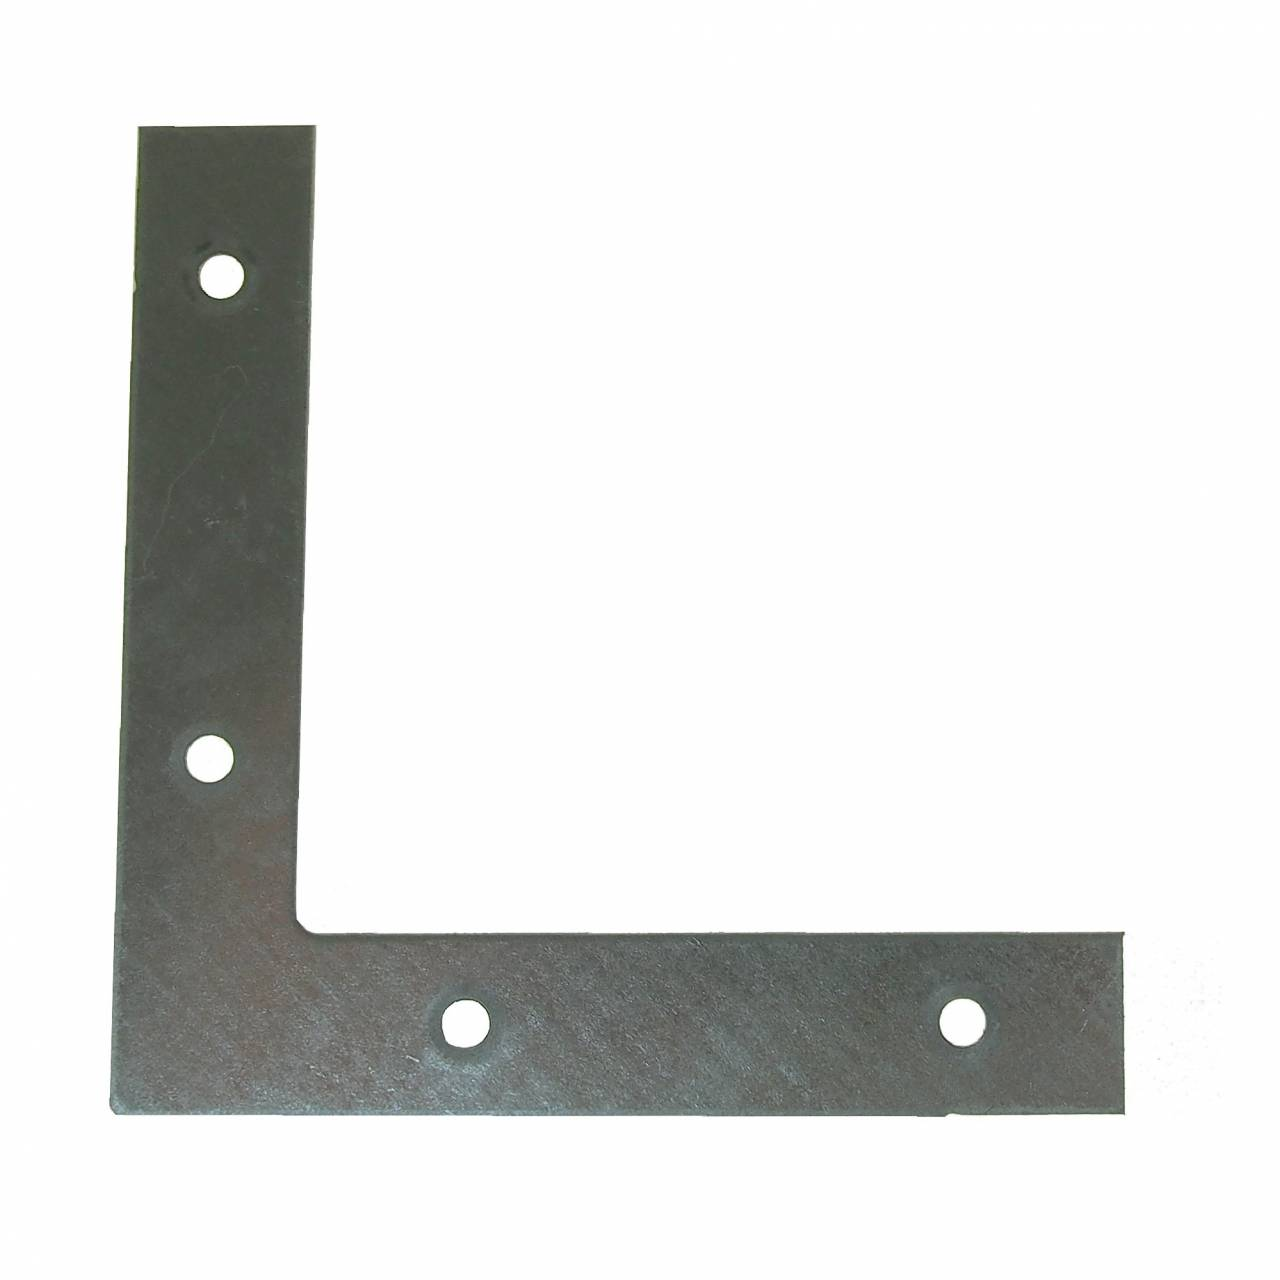 Flachwinkel vz 40 x 40 x 10 x 1,5 mm / Pck a 5 Stück